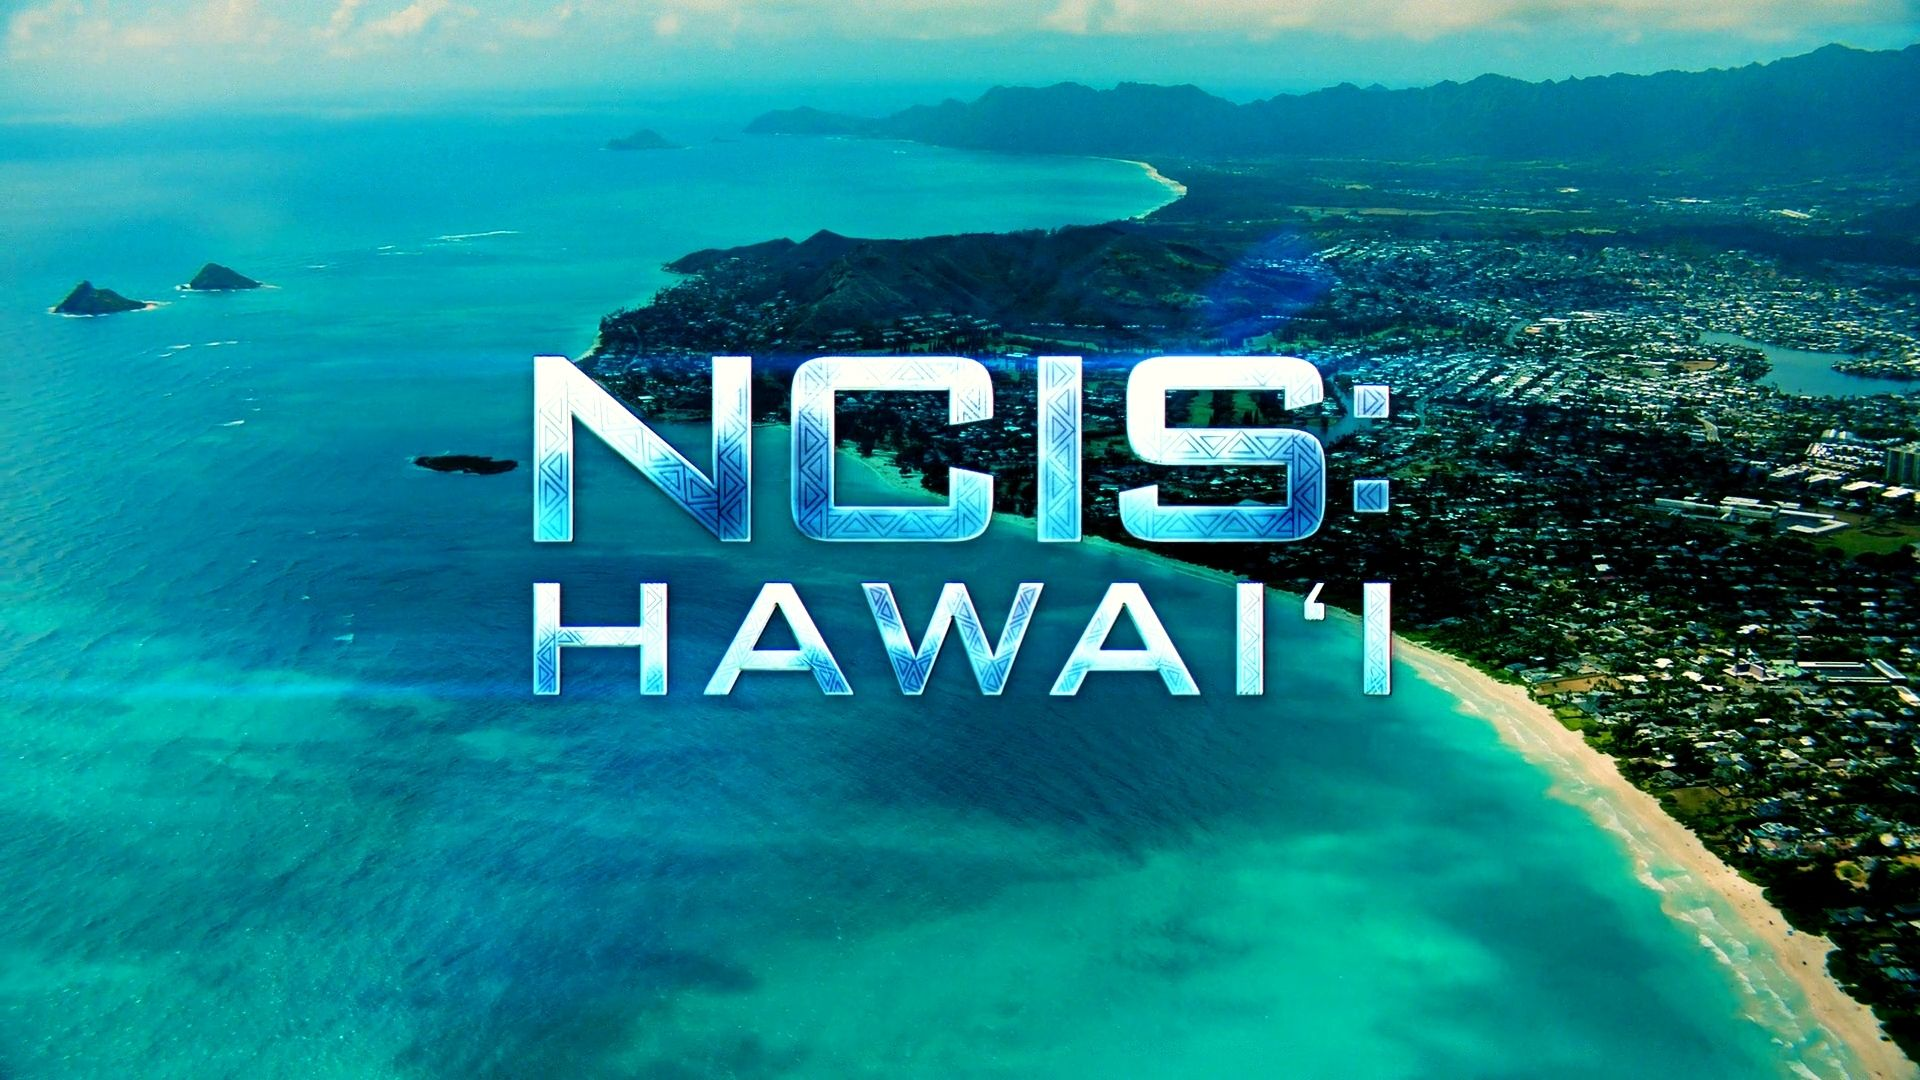 NCIS Hawaii Season 1 Episode 3